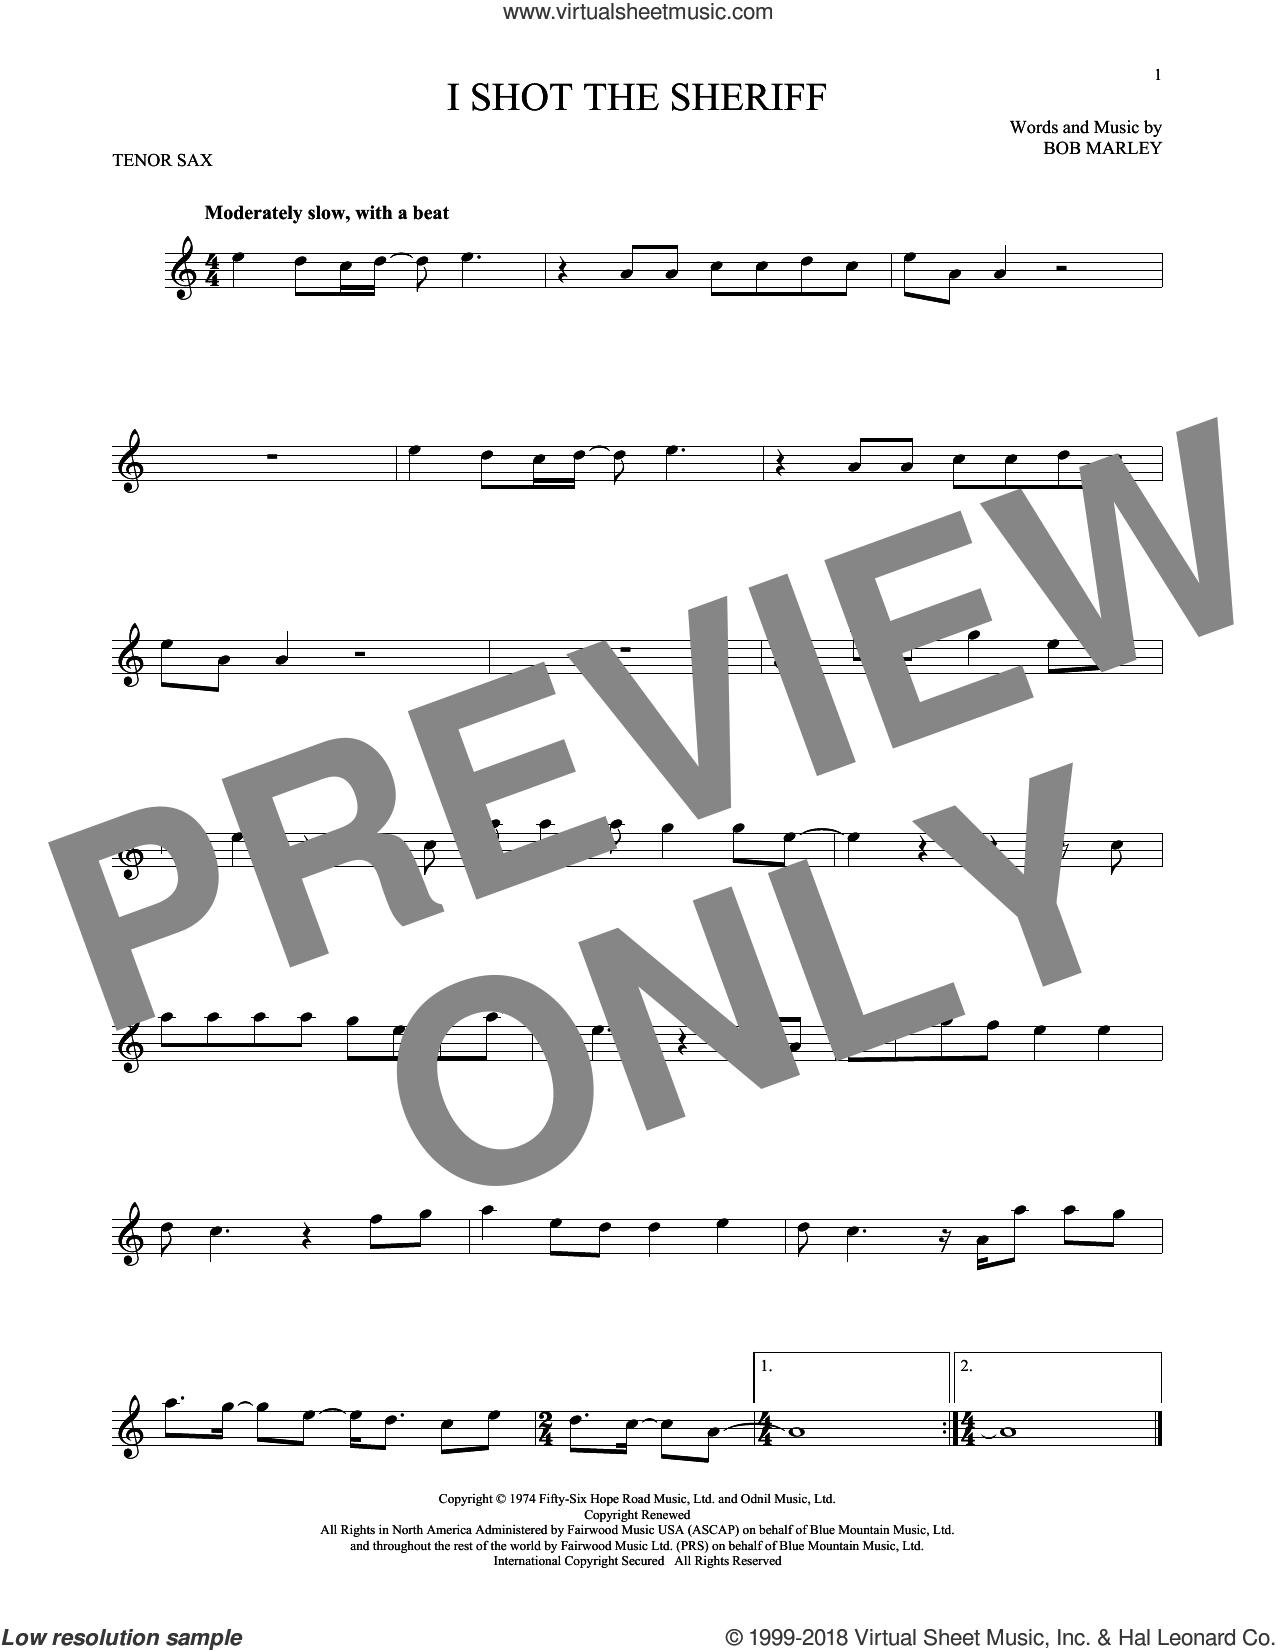 I Shot The Sheriff sheet music for tenor saxophone solo by Bob Marley, Eric Clapton and Warren G, intermediate skill level